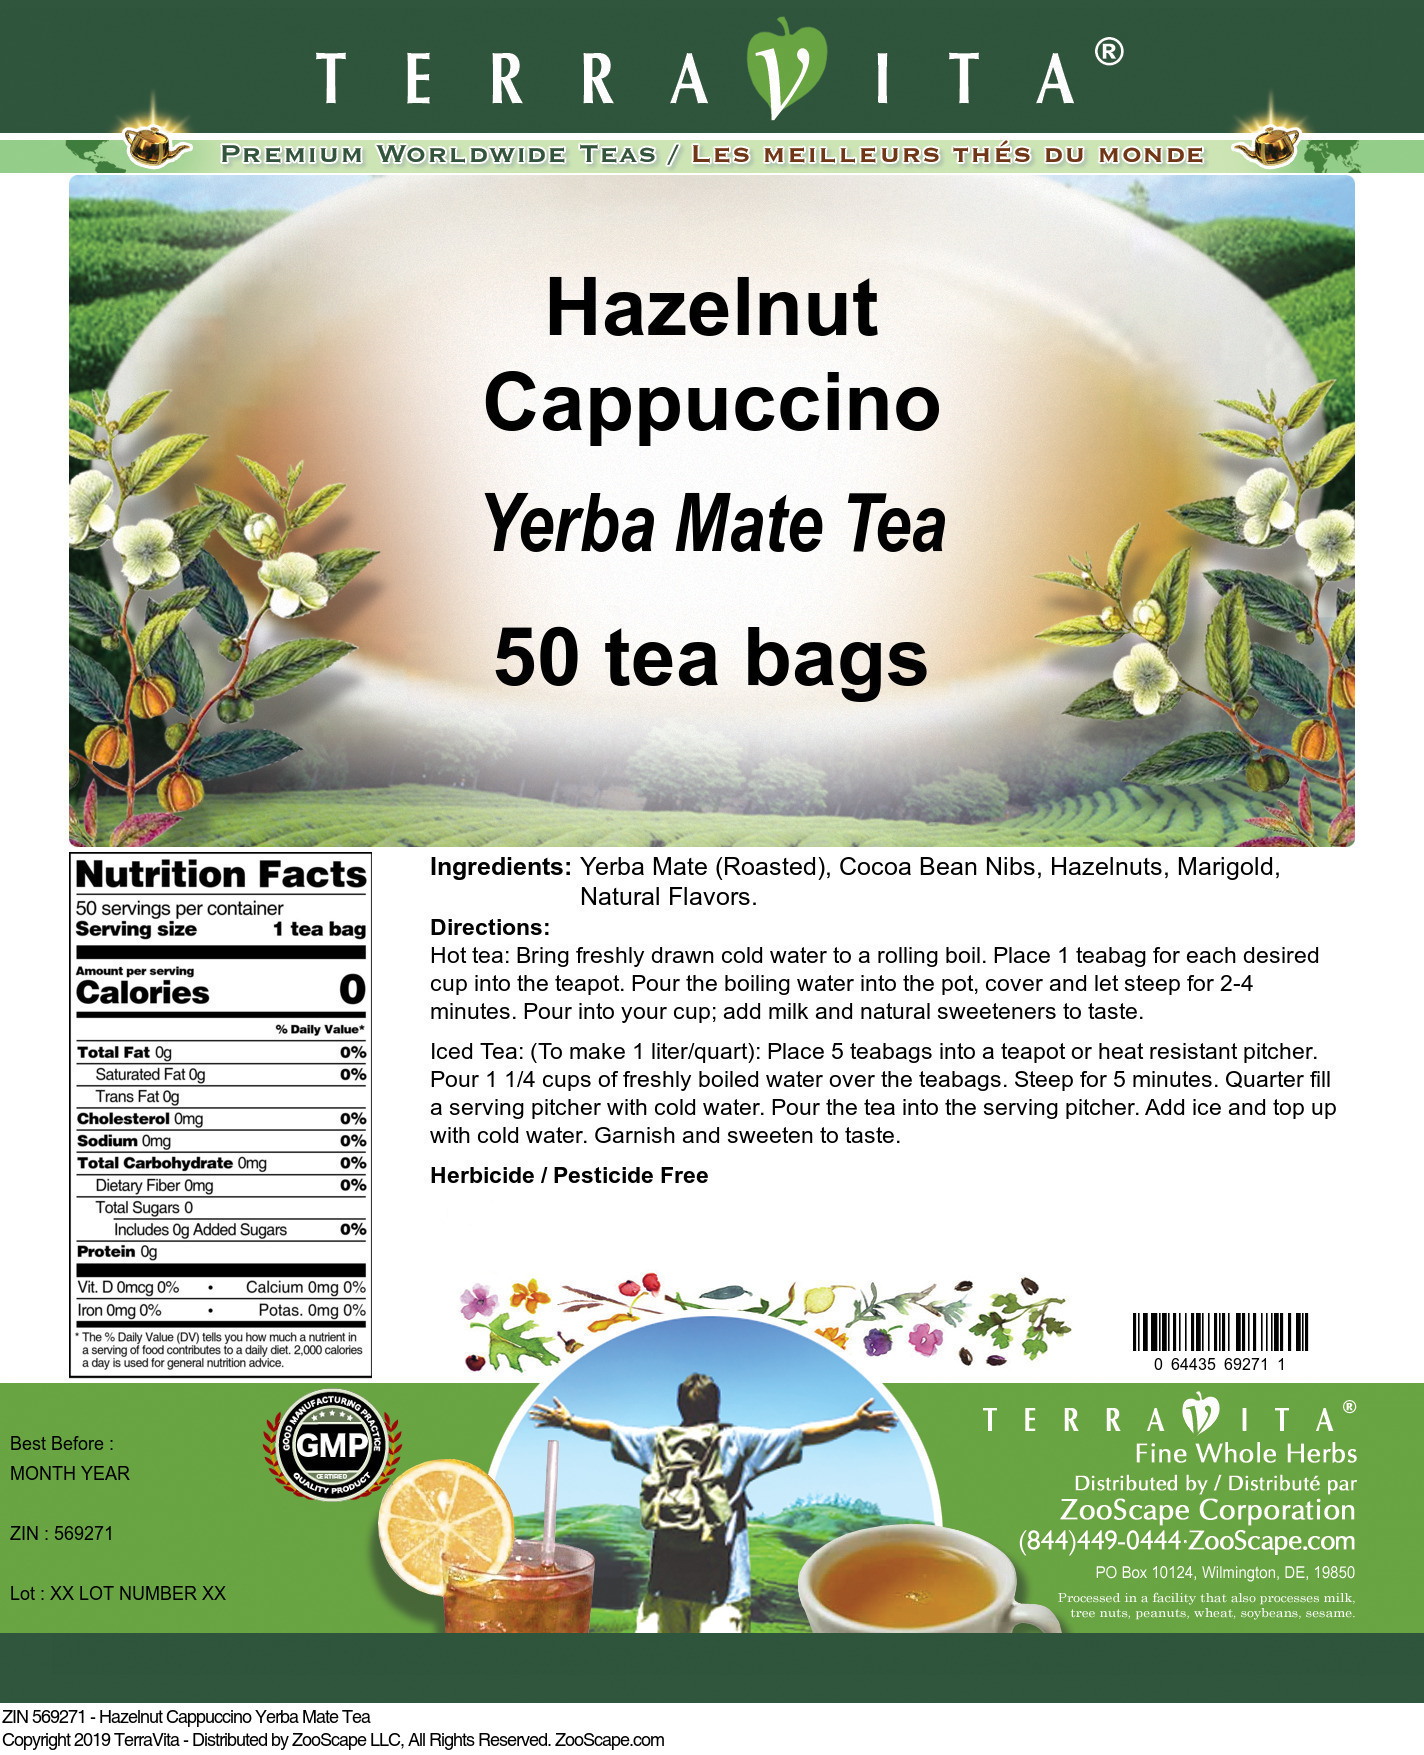 Hazelnut Cappuccino Yerba Mate